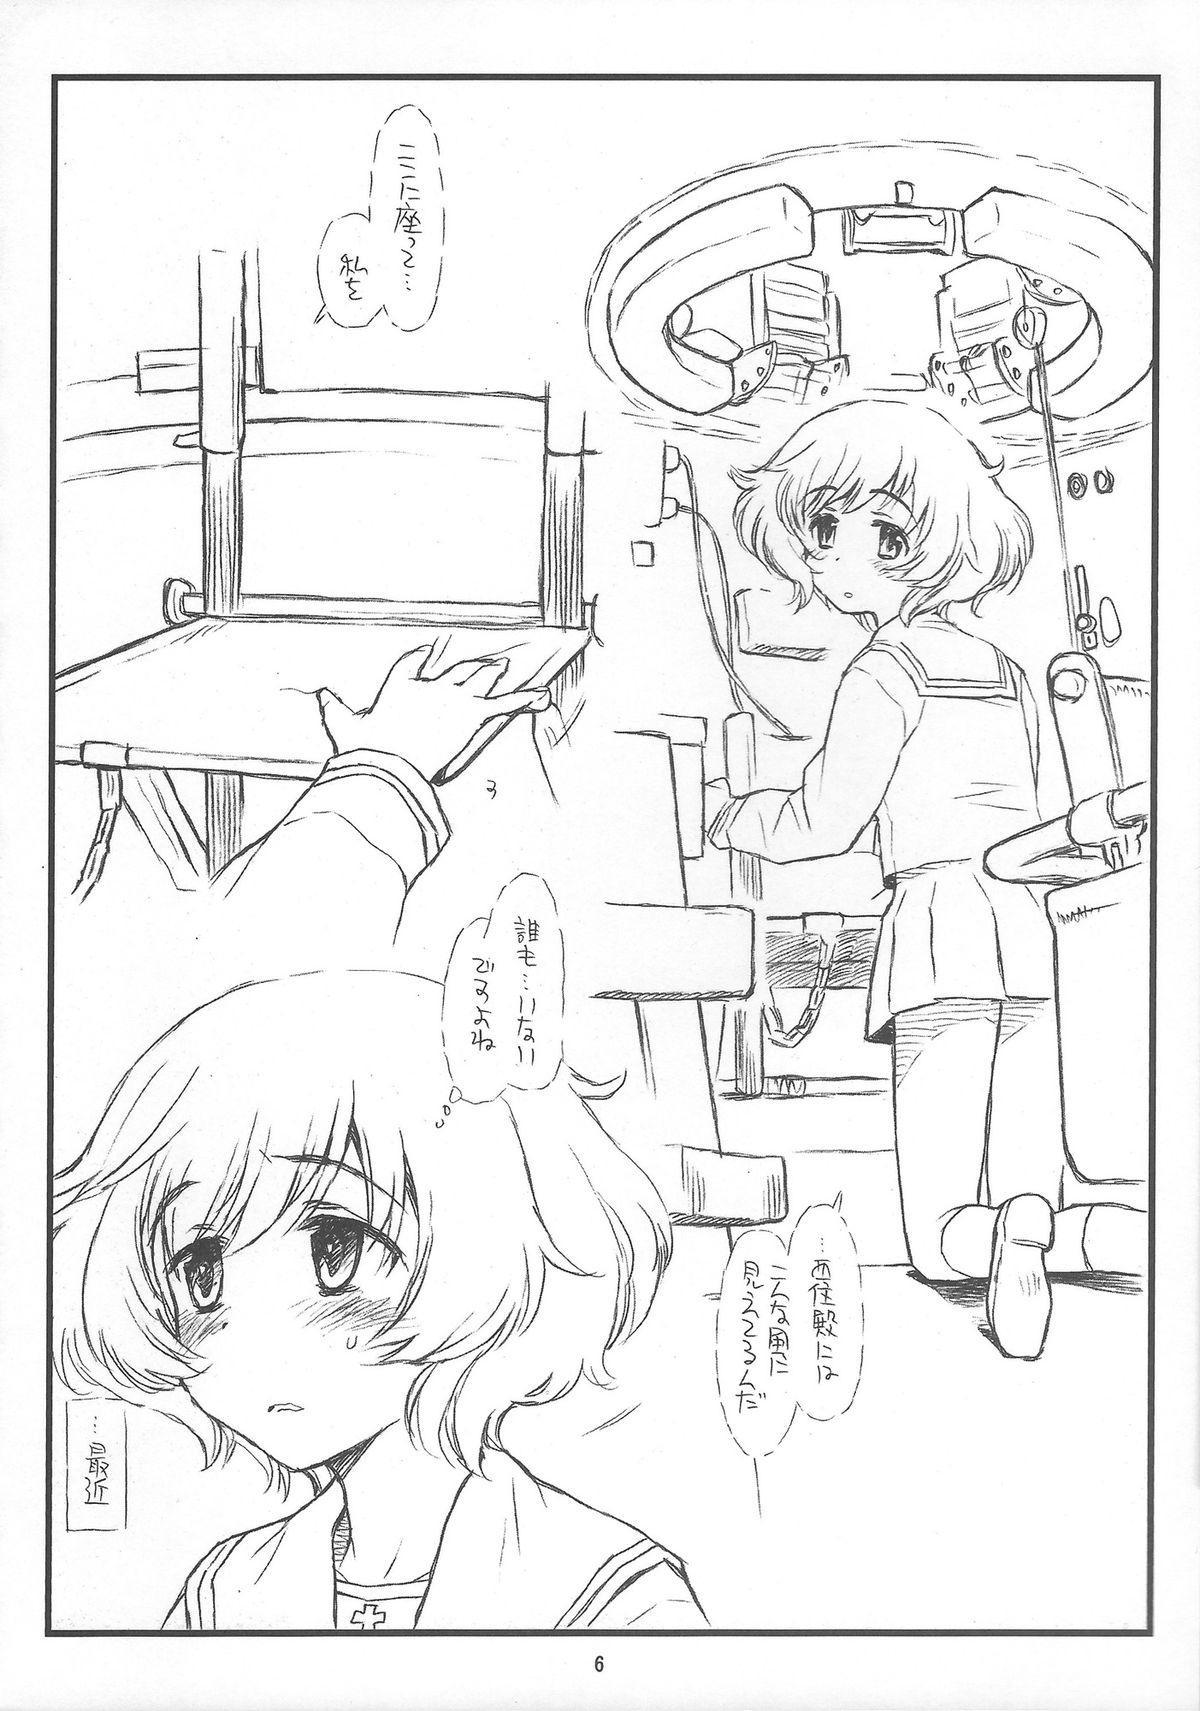 (C84) [bolze.] 「Honanie + Akiyama-dono Sennyudaisakusen (Sippai)」 (Girls und Panzer) 5